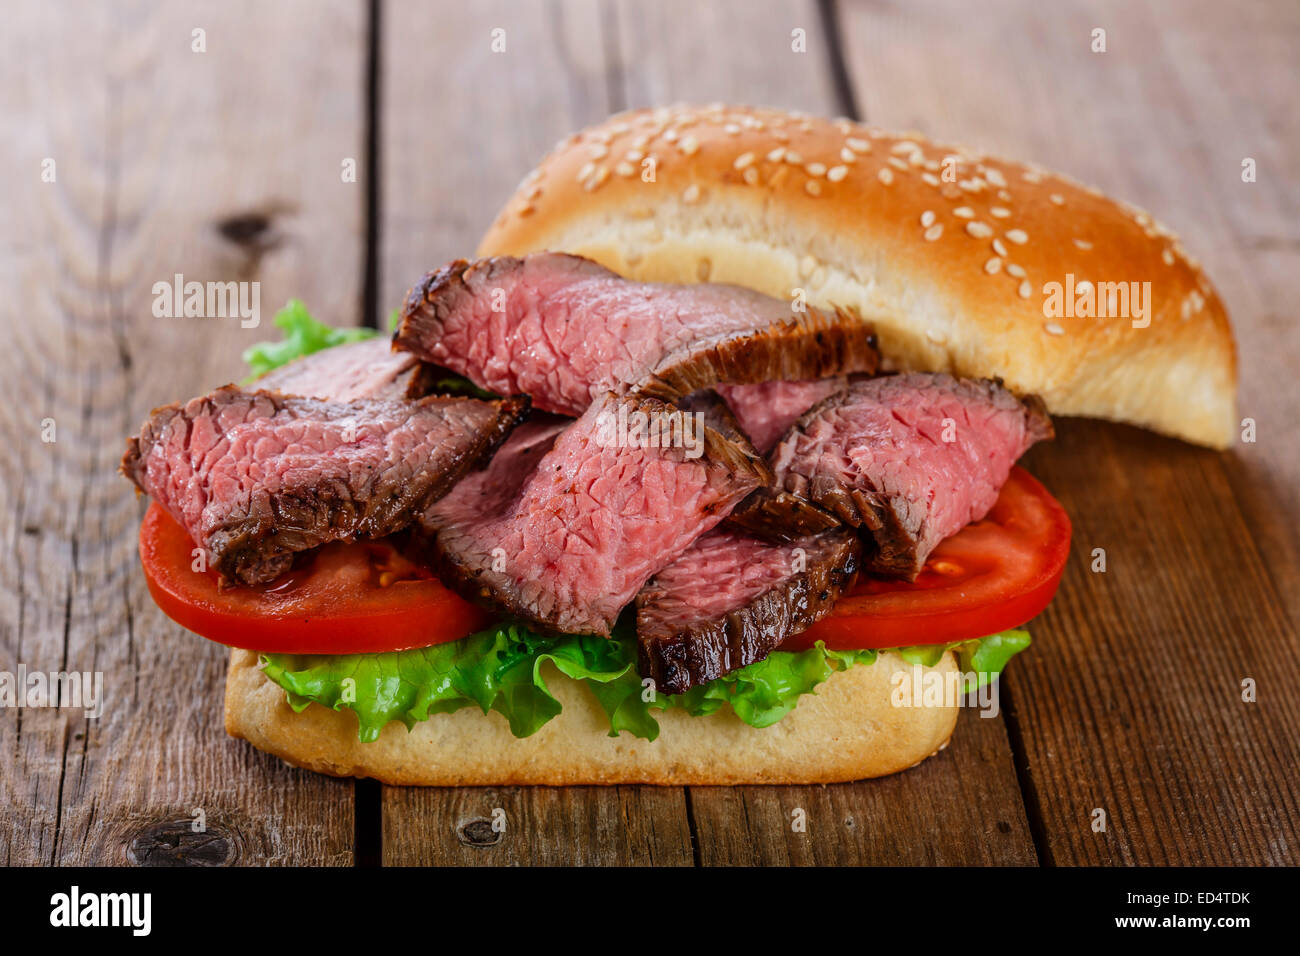 roast beef hamburger sandwich on a wooden surface - Stock Image